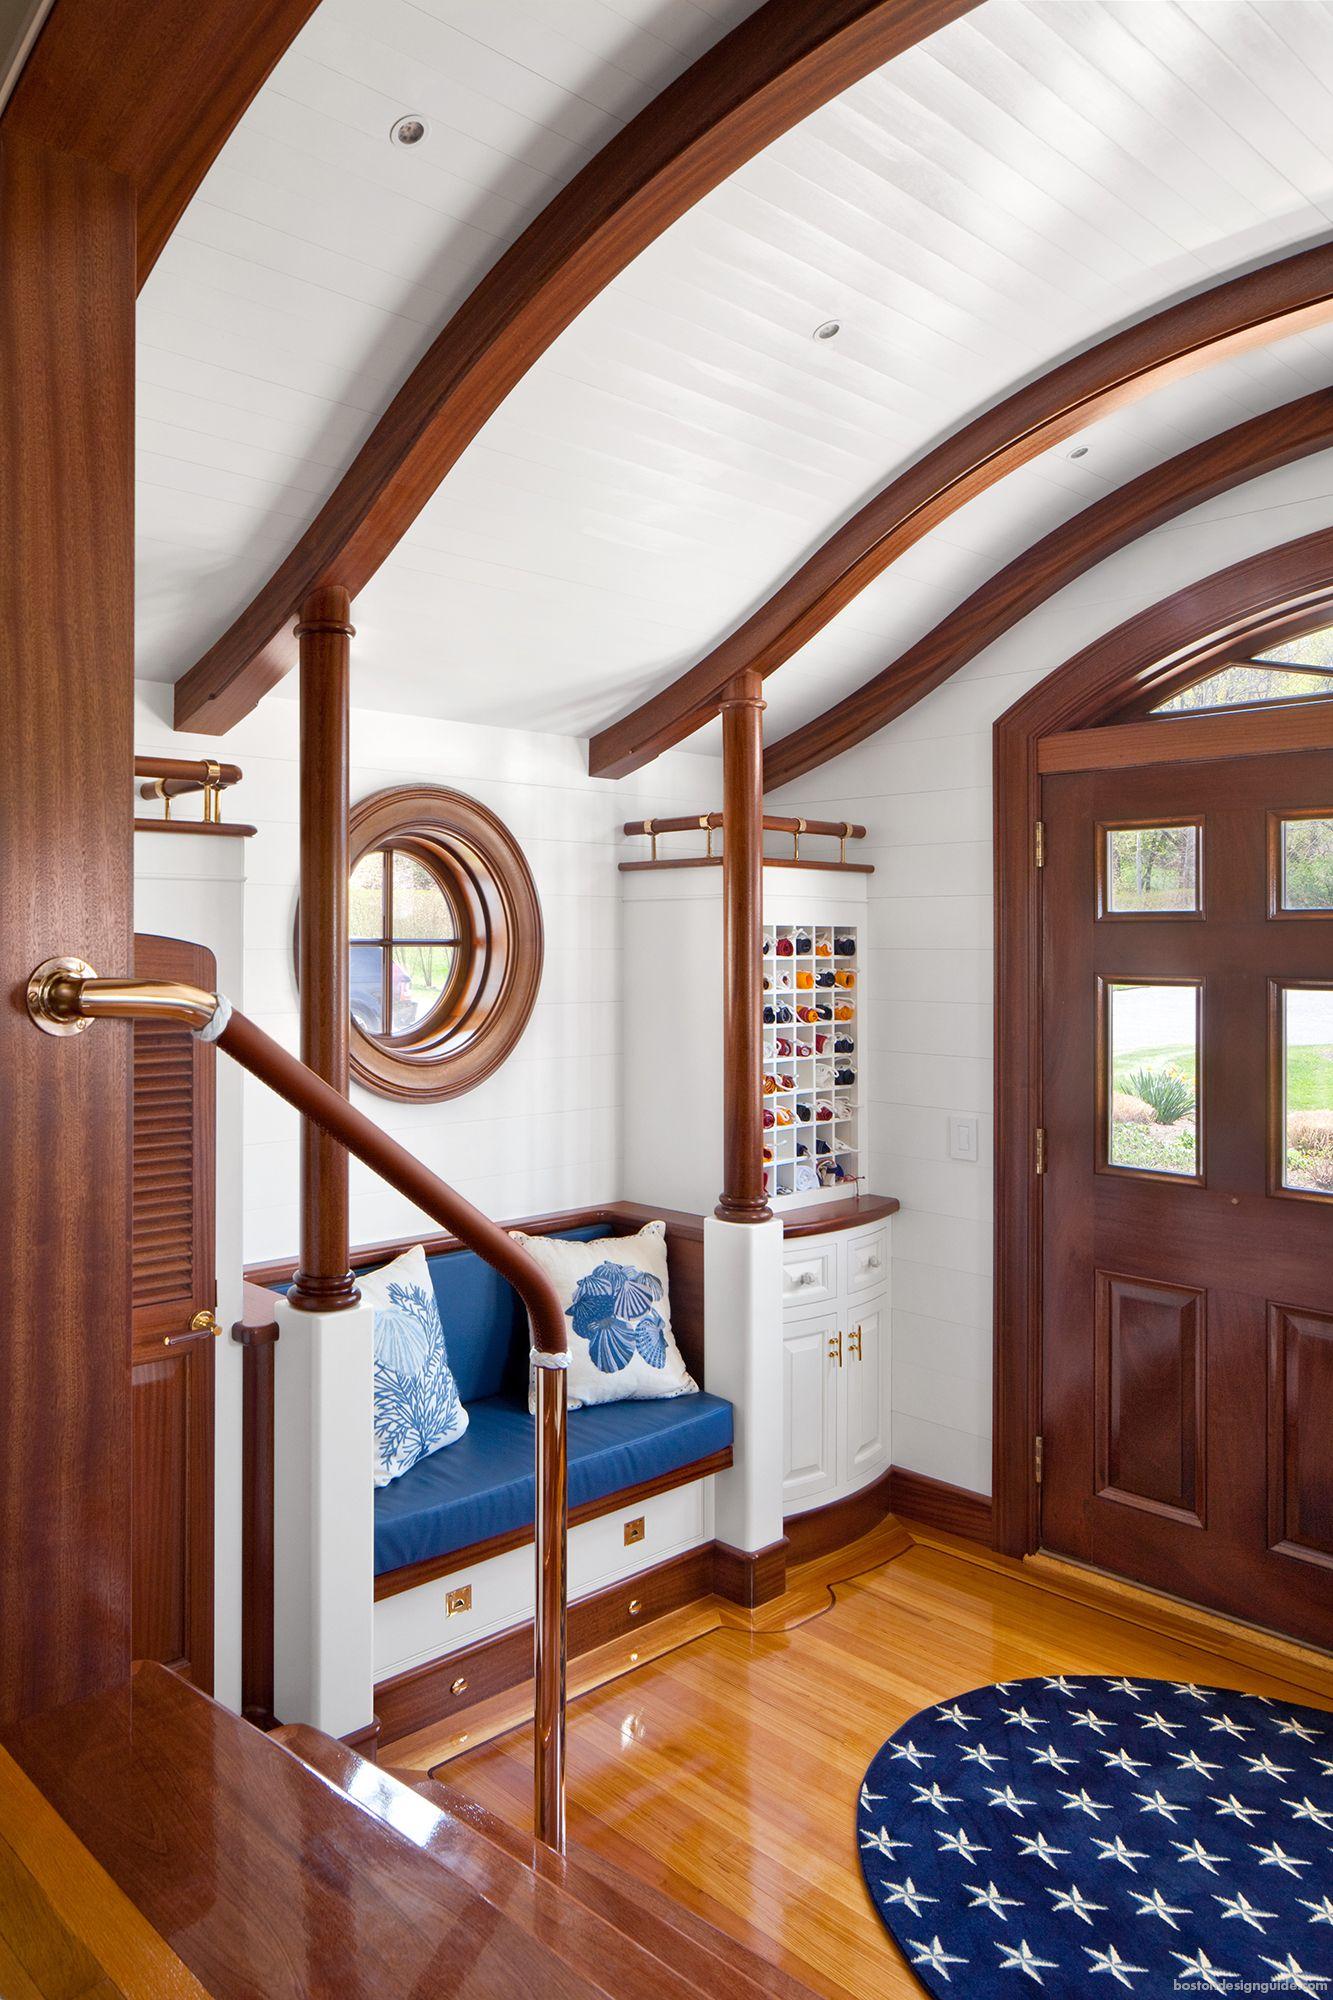 Nautical Yacht Inspired Home Architectural Millwork Wetstone Millwork Boat Interior Design Yacht Interior Design Home